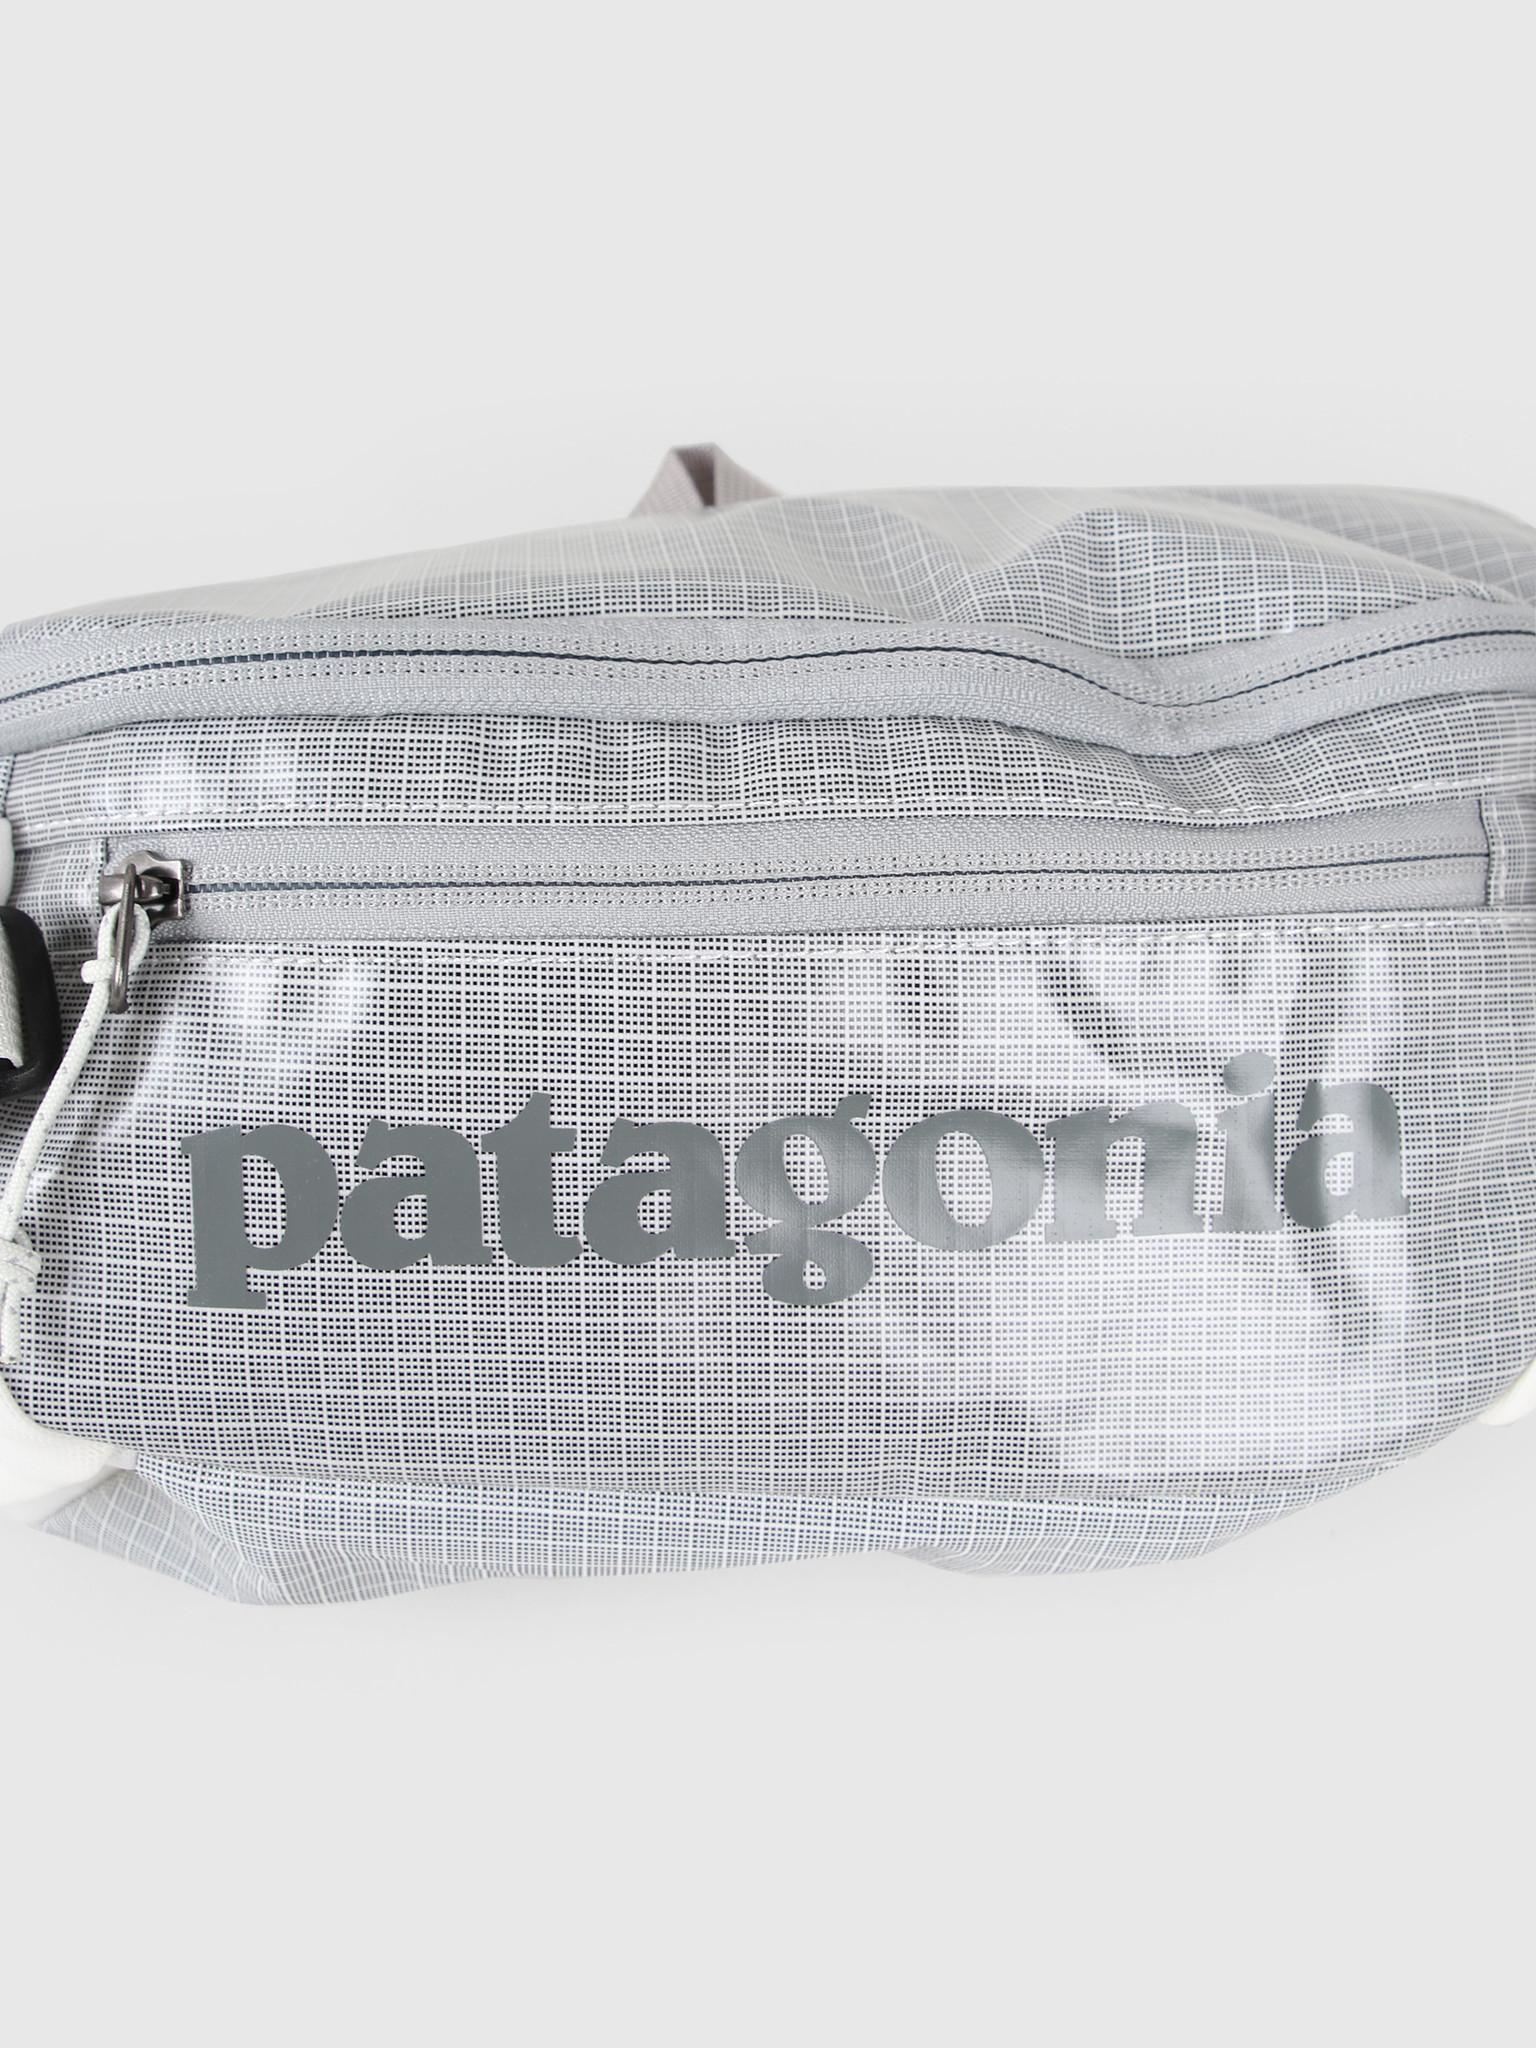 Patagonia Patagonia Black Hole Waist Pack 5L Birch White 49281